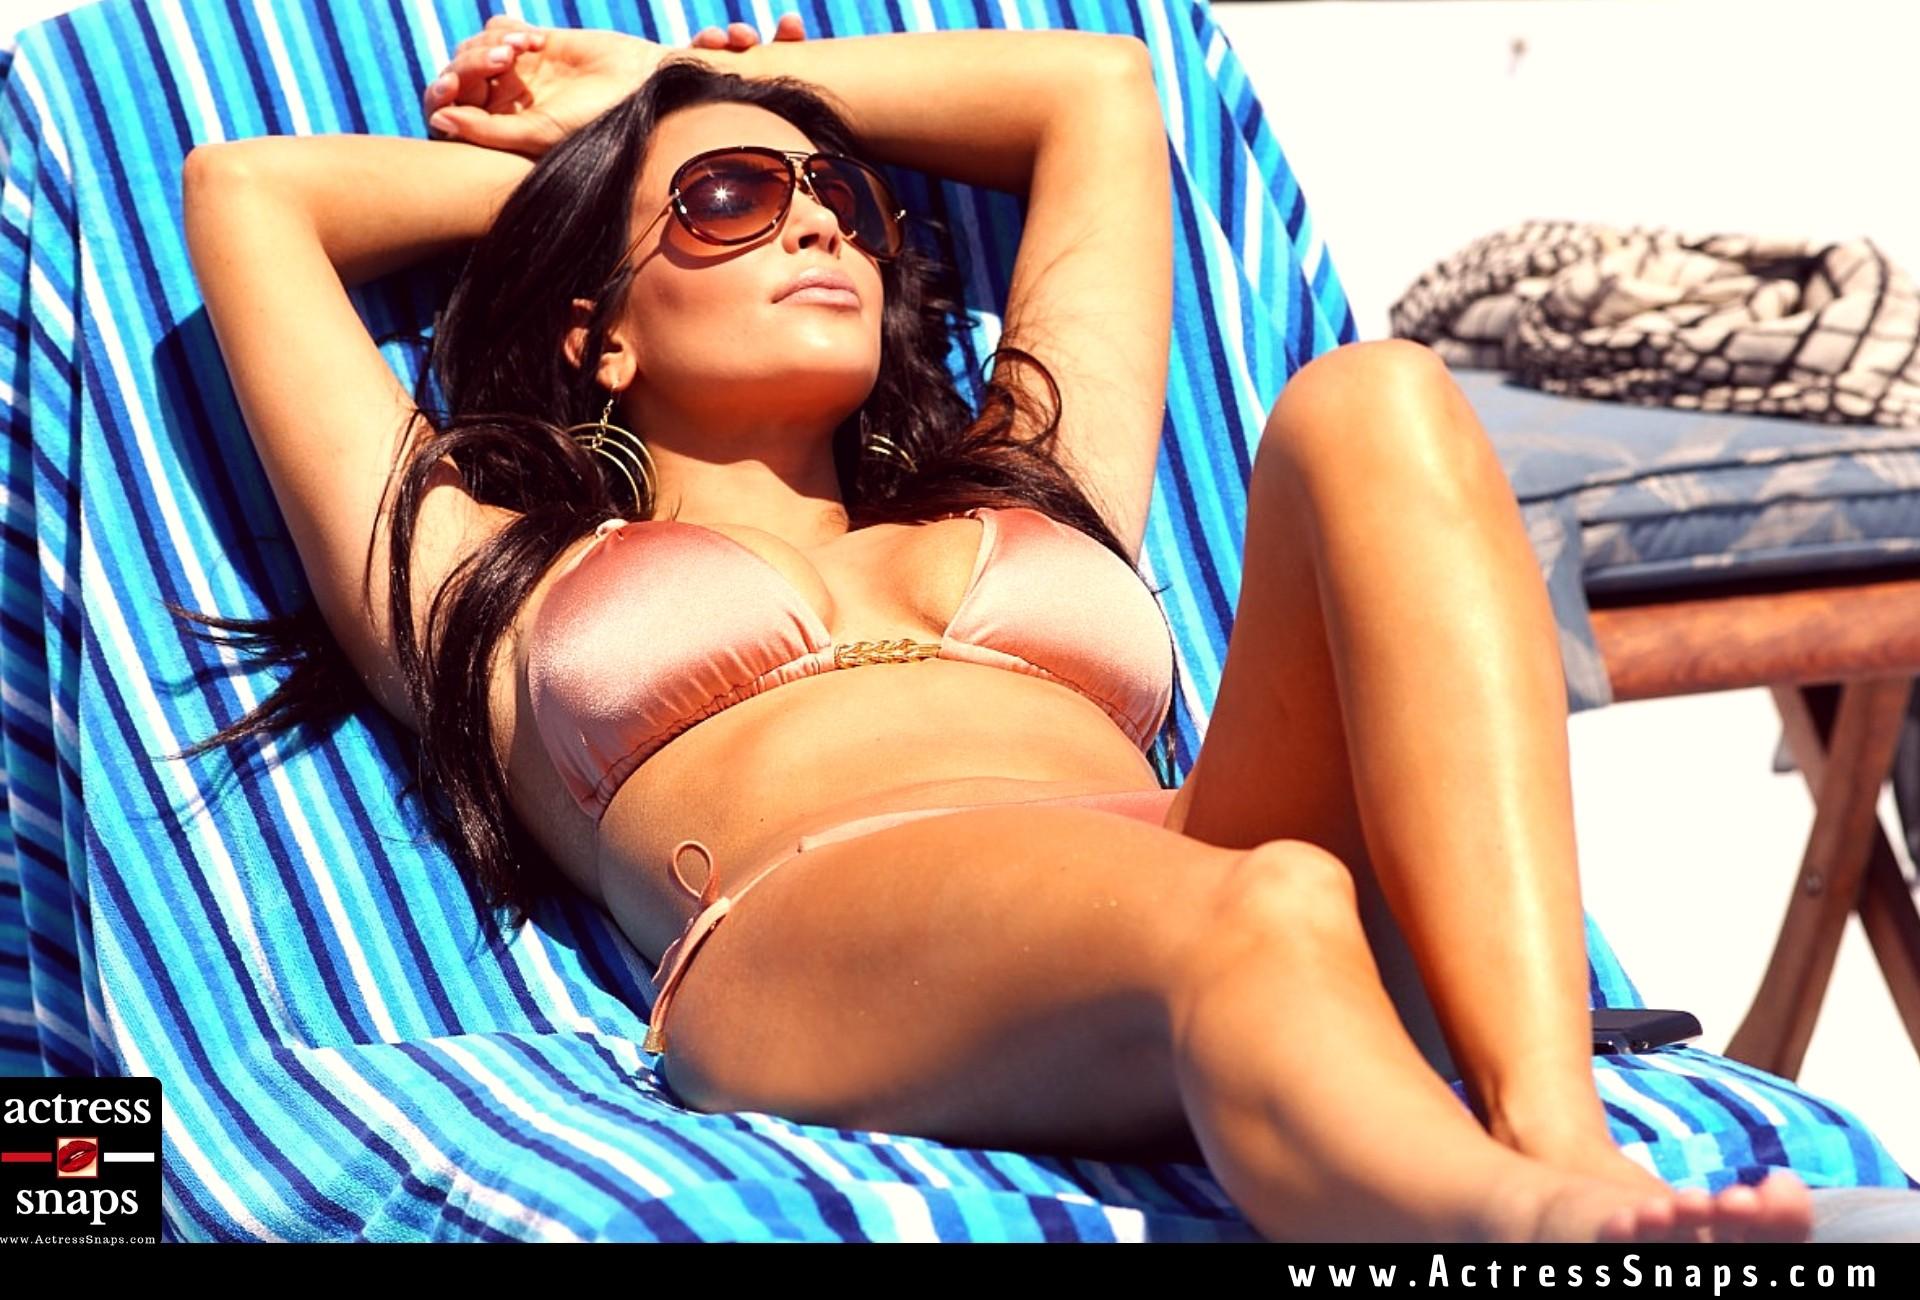 Kim Kardashian Bikini Candids from Miami - Sexy Actress Pictures | Hot Actress Pictures - ActressSnaps.com